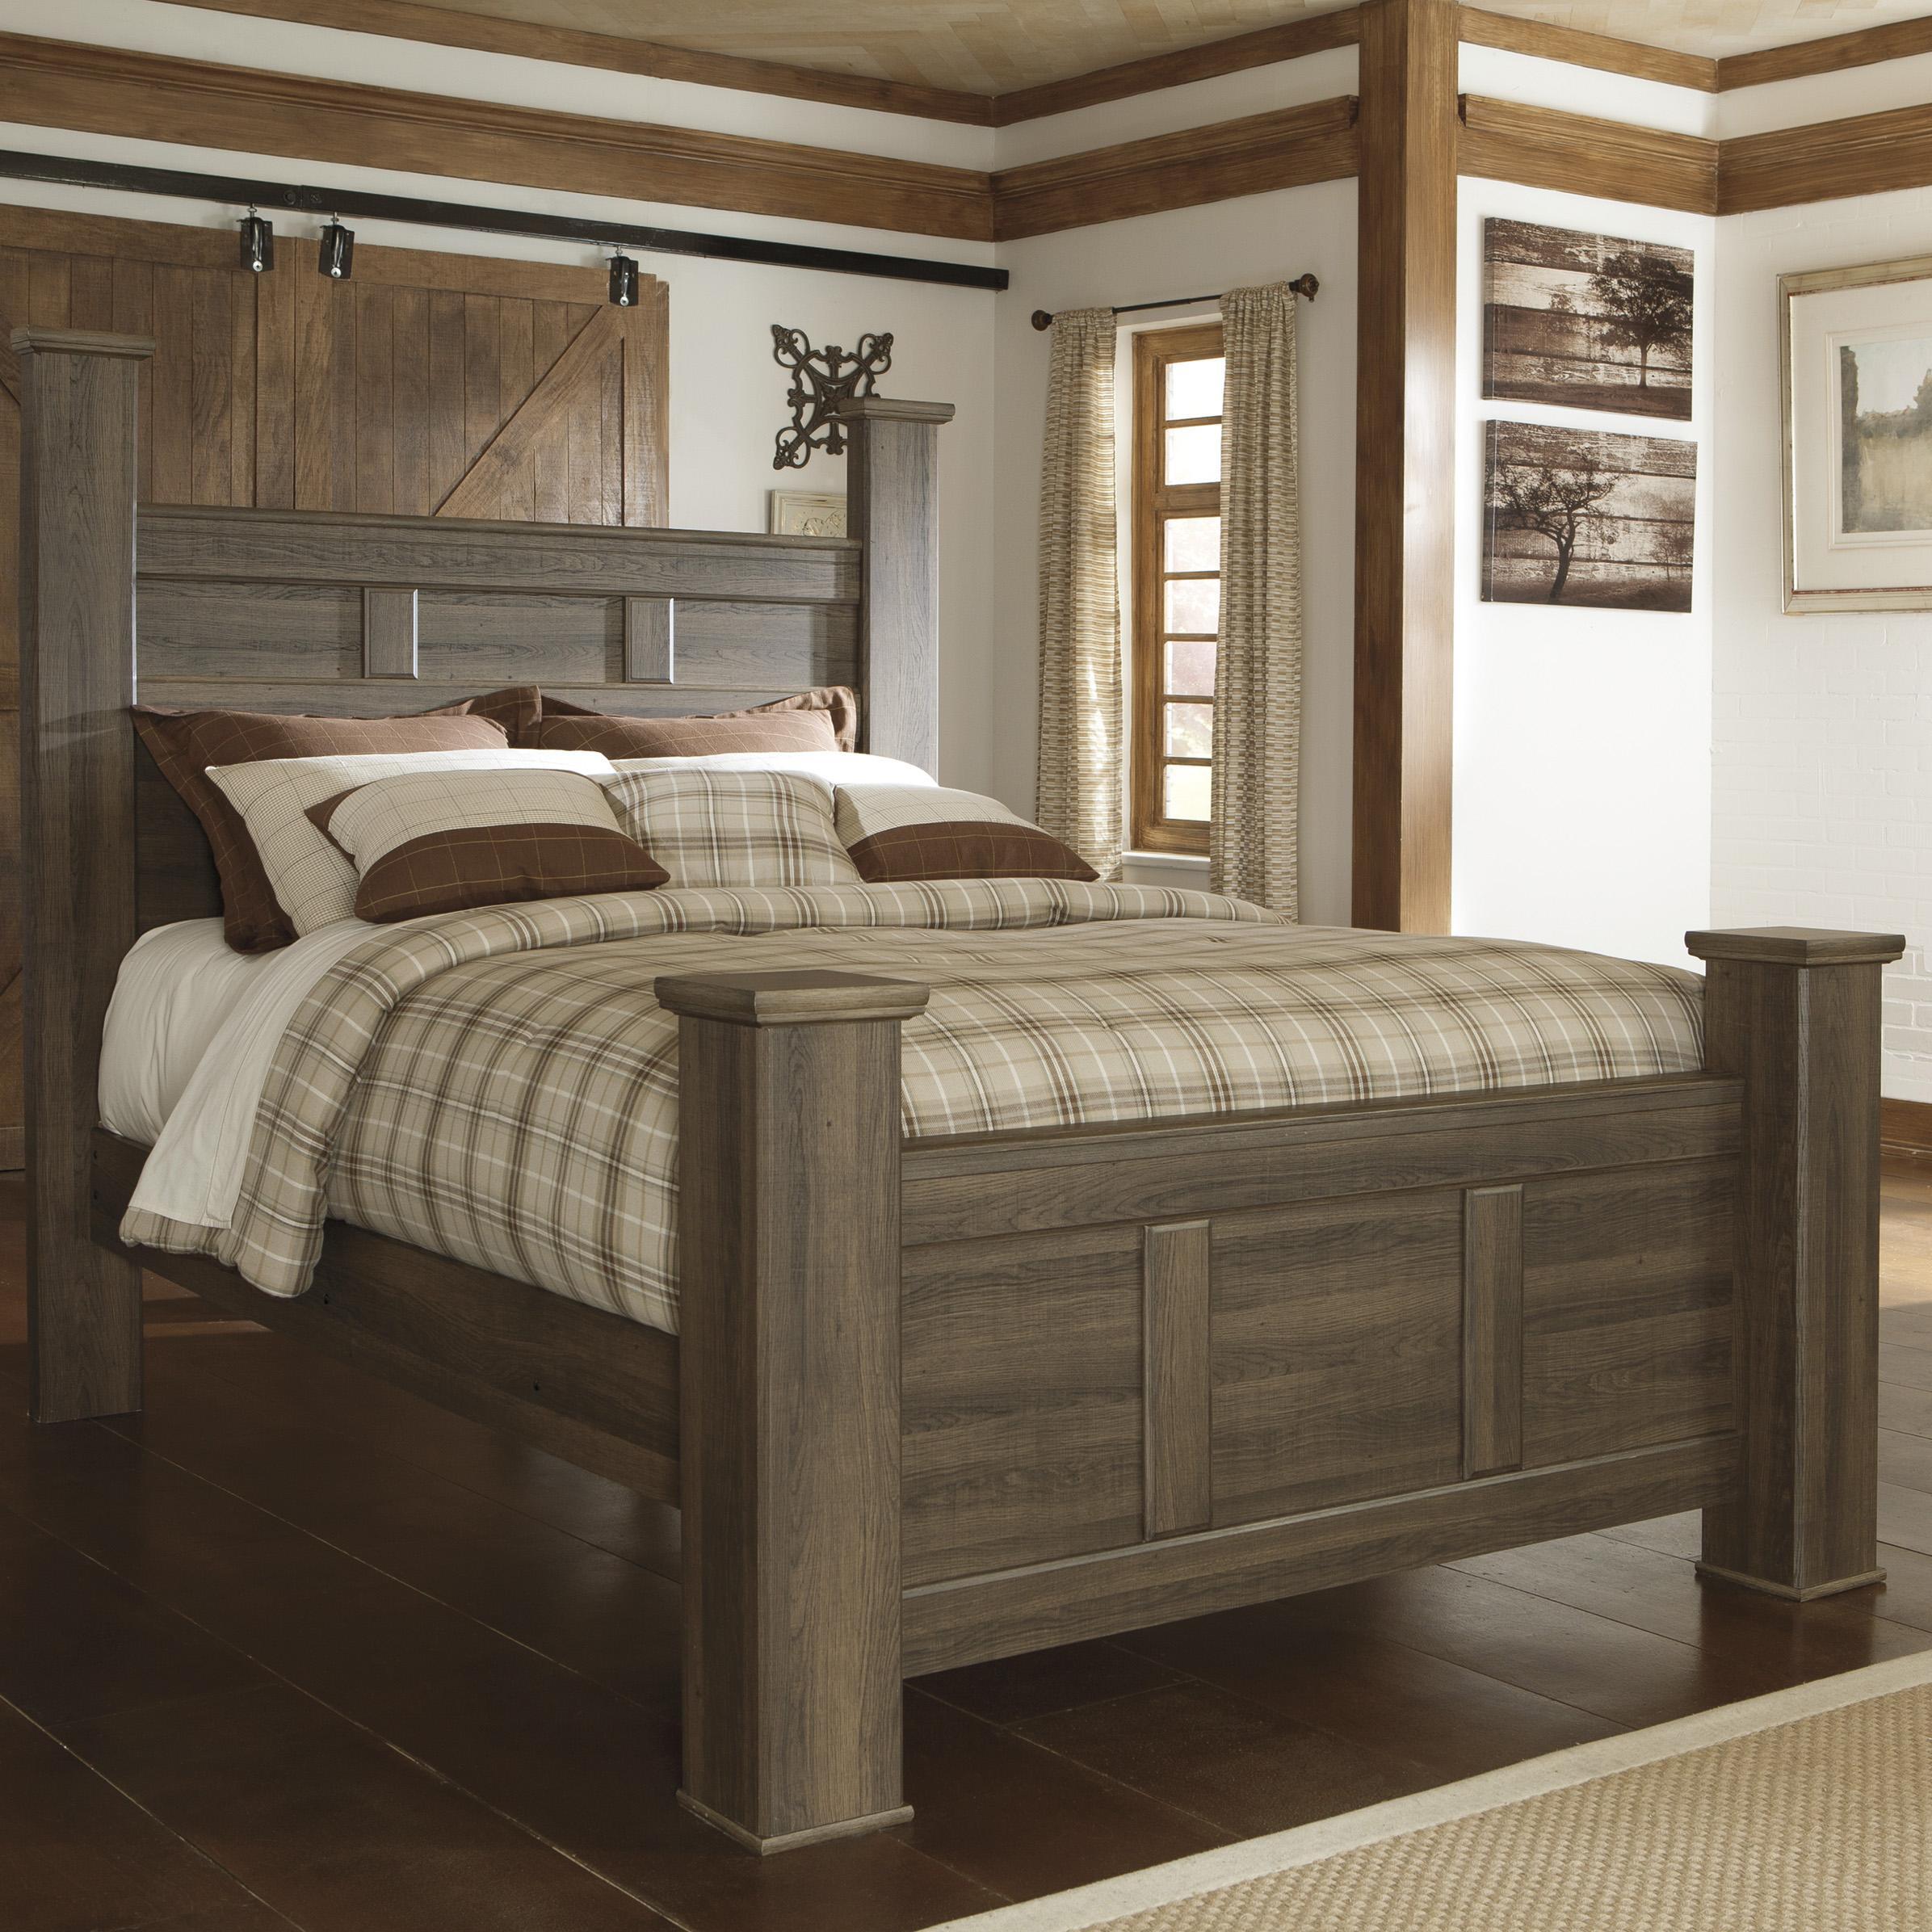 Bedroom Sets Ri bedroom sets providence ri - amazing bedroom, living room